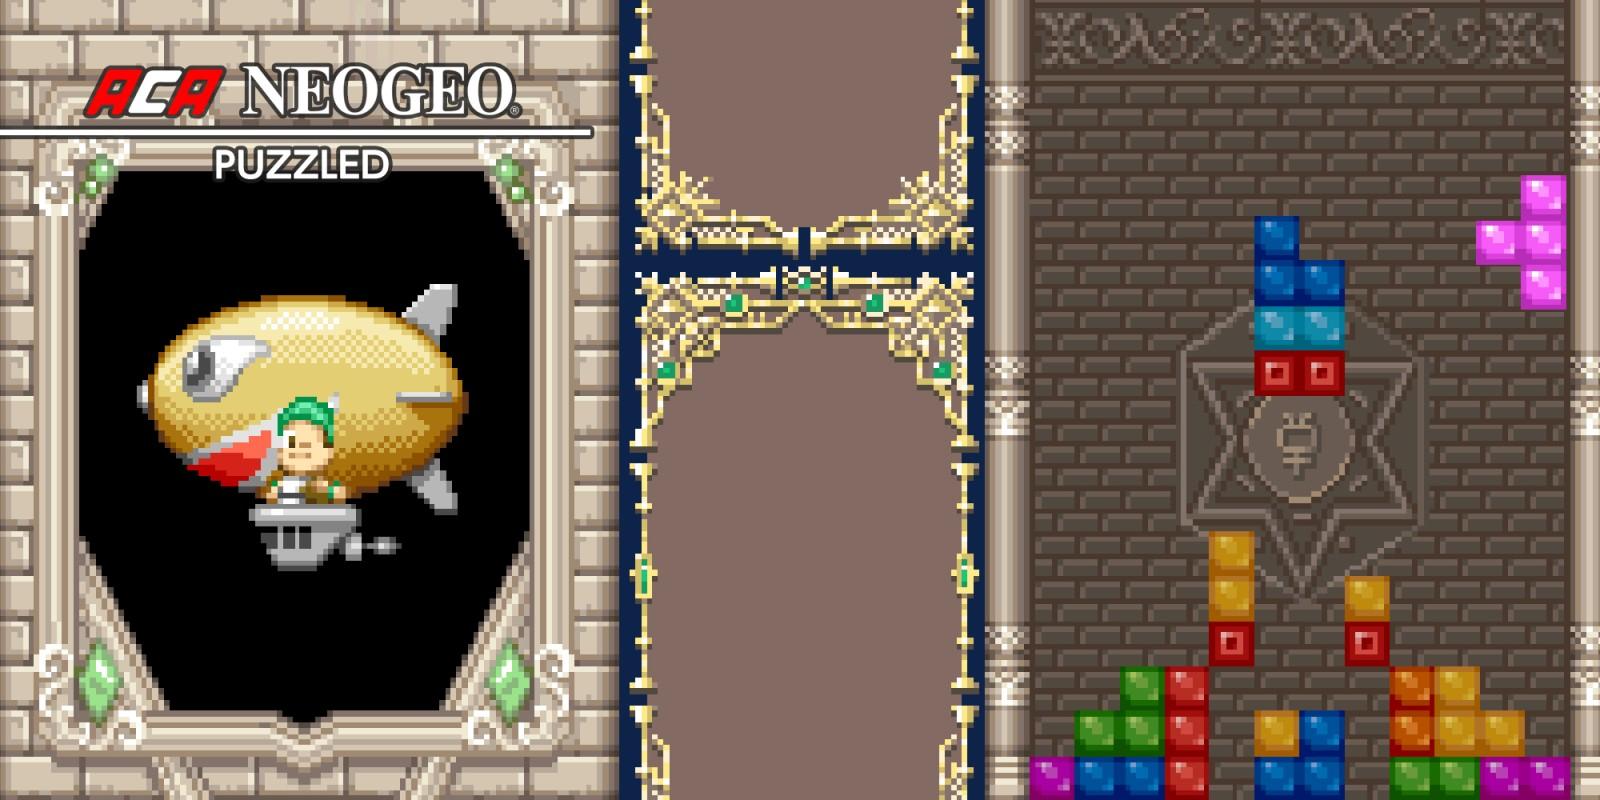 Aca Neogeo Puzzled Nintendo Switch Download Software